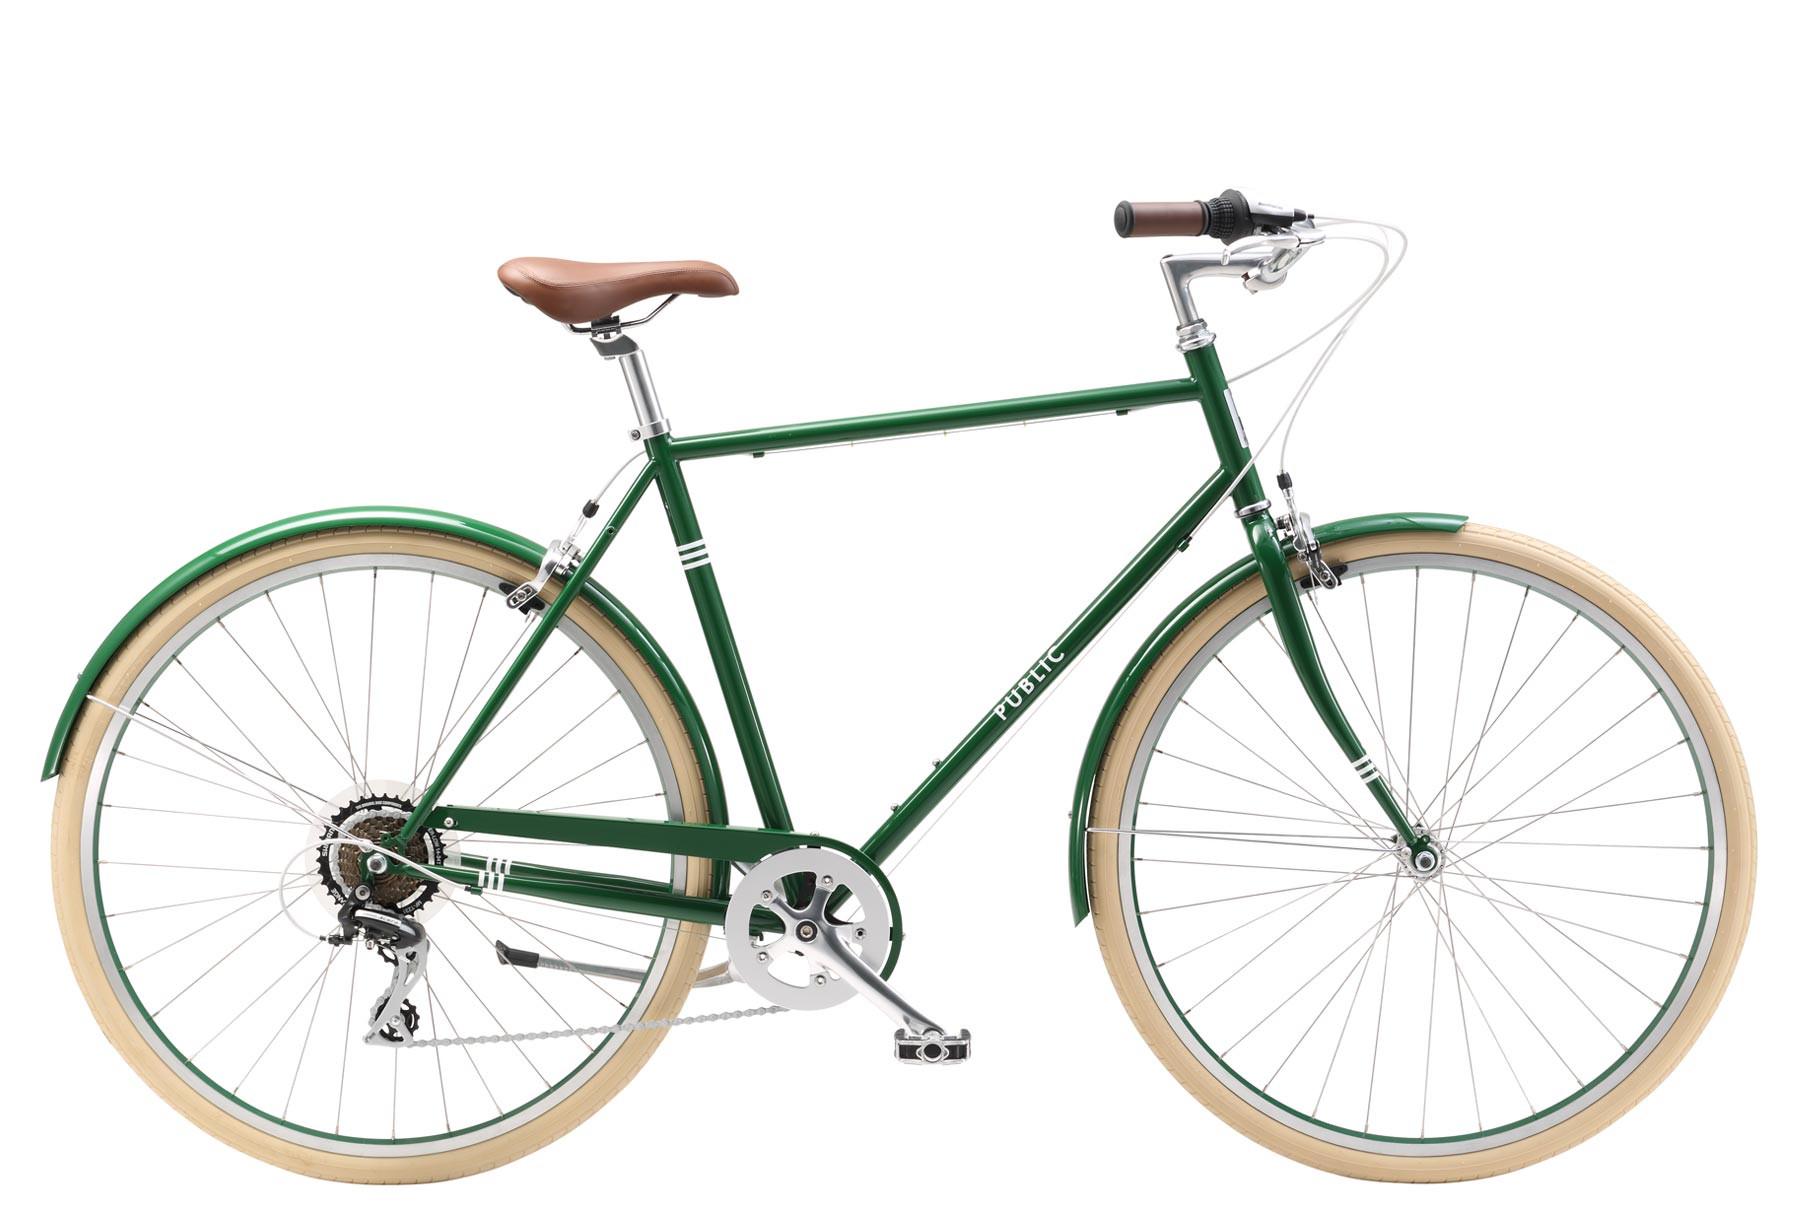 Green bicycle photo